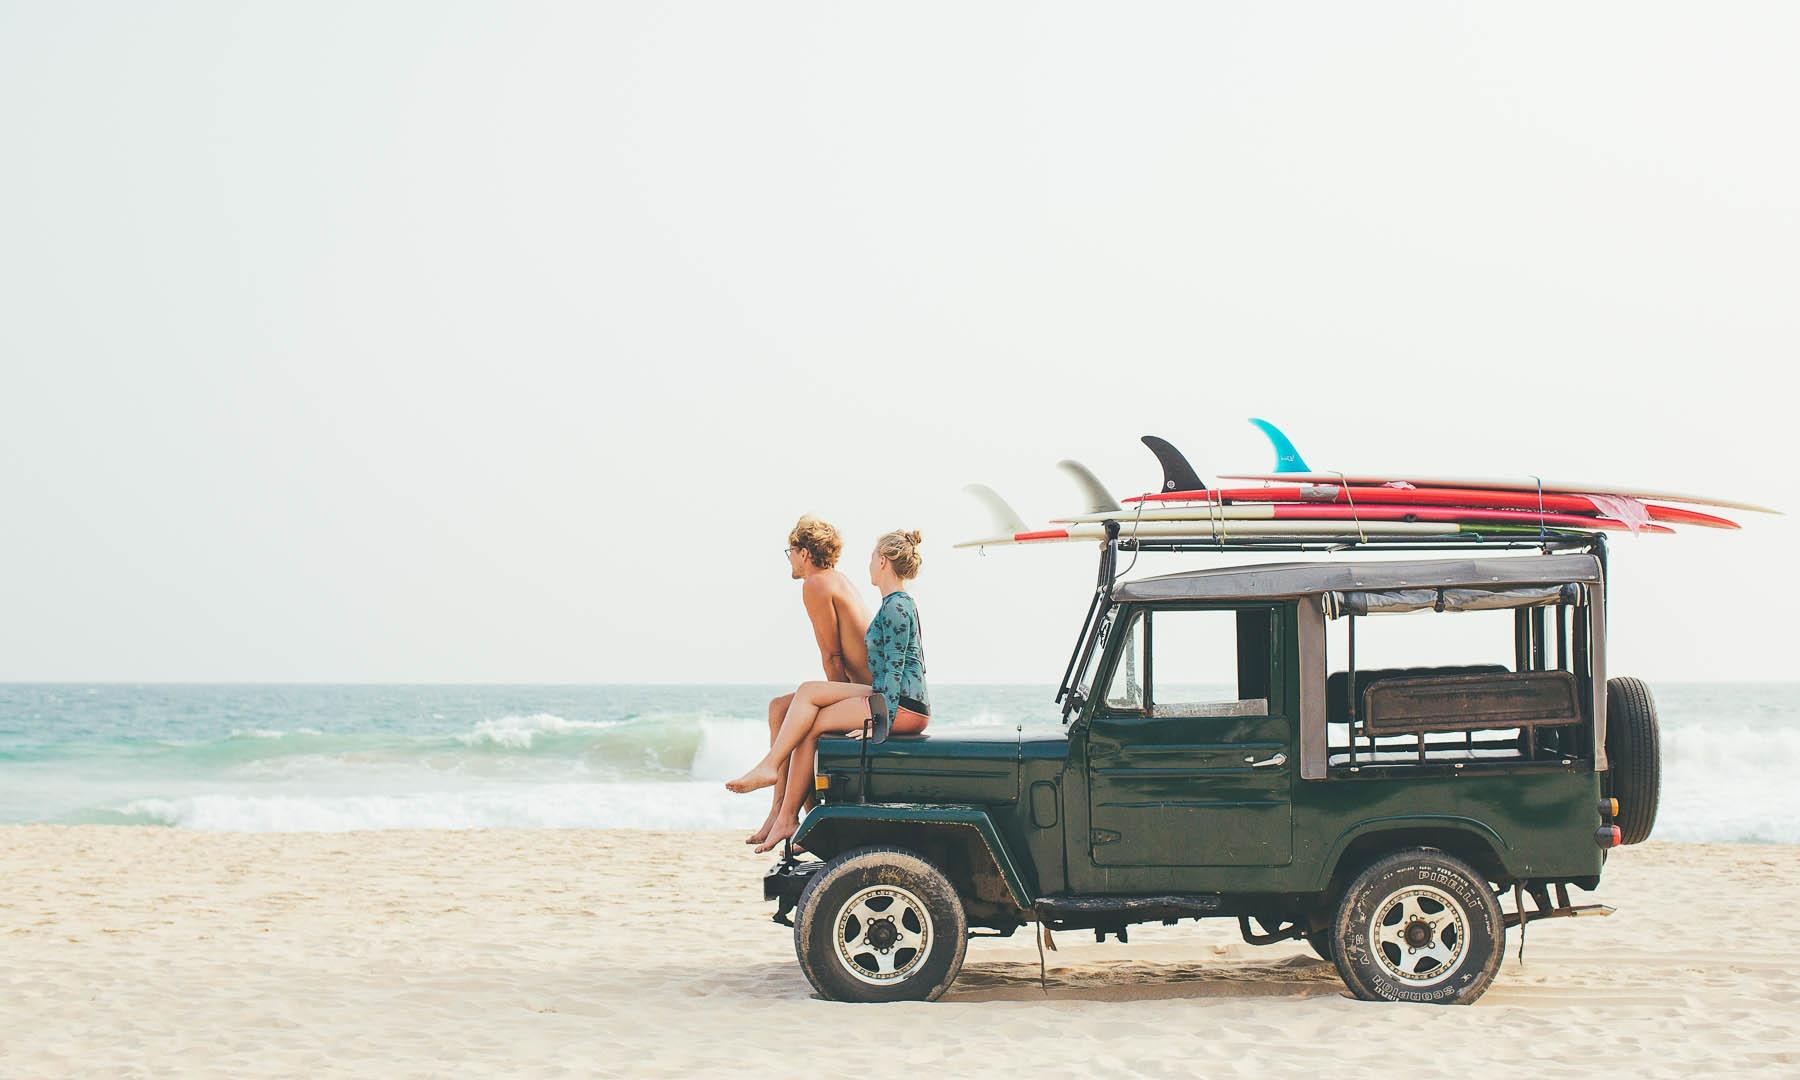 Surf-Camp-Yoga-Retreat-Sri Lanka-Hikkaduwa-Midigama-Arugam Bay-Pottuvil-Mirissa-Ahangama-Madiha-Medawatta-Sunshinestories-surf-travel-blog-Sunshineprint-highresM06A0393.jpg